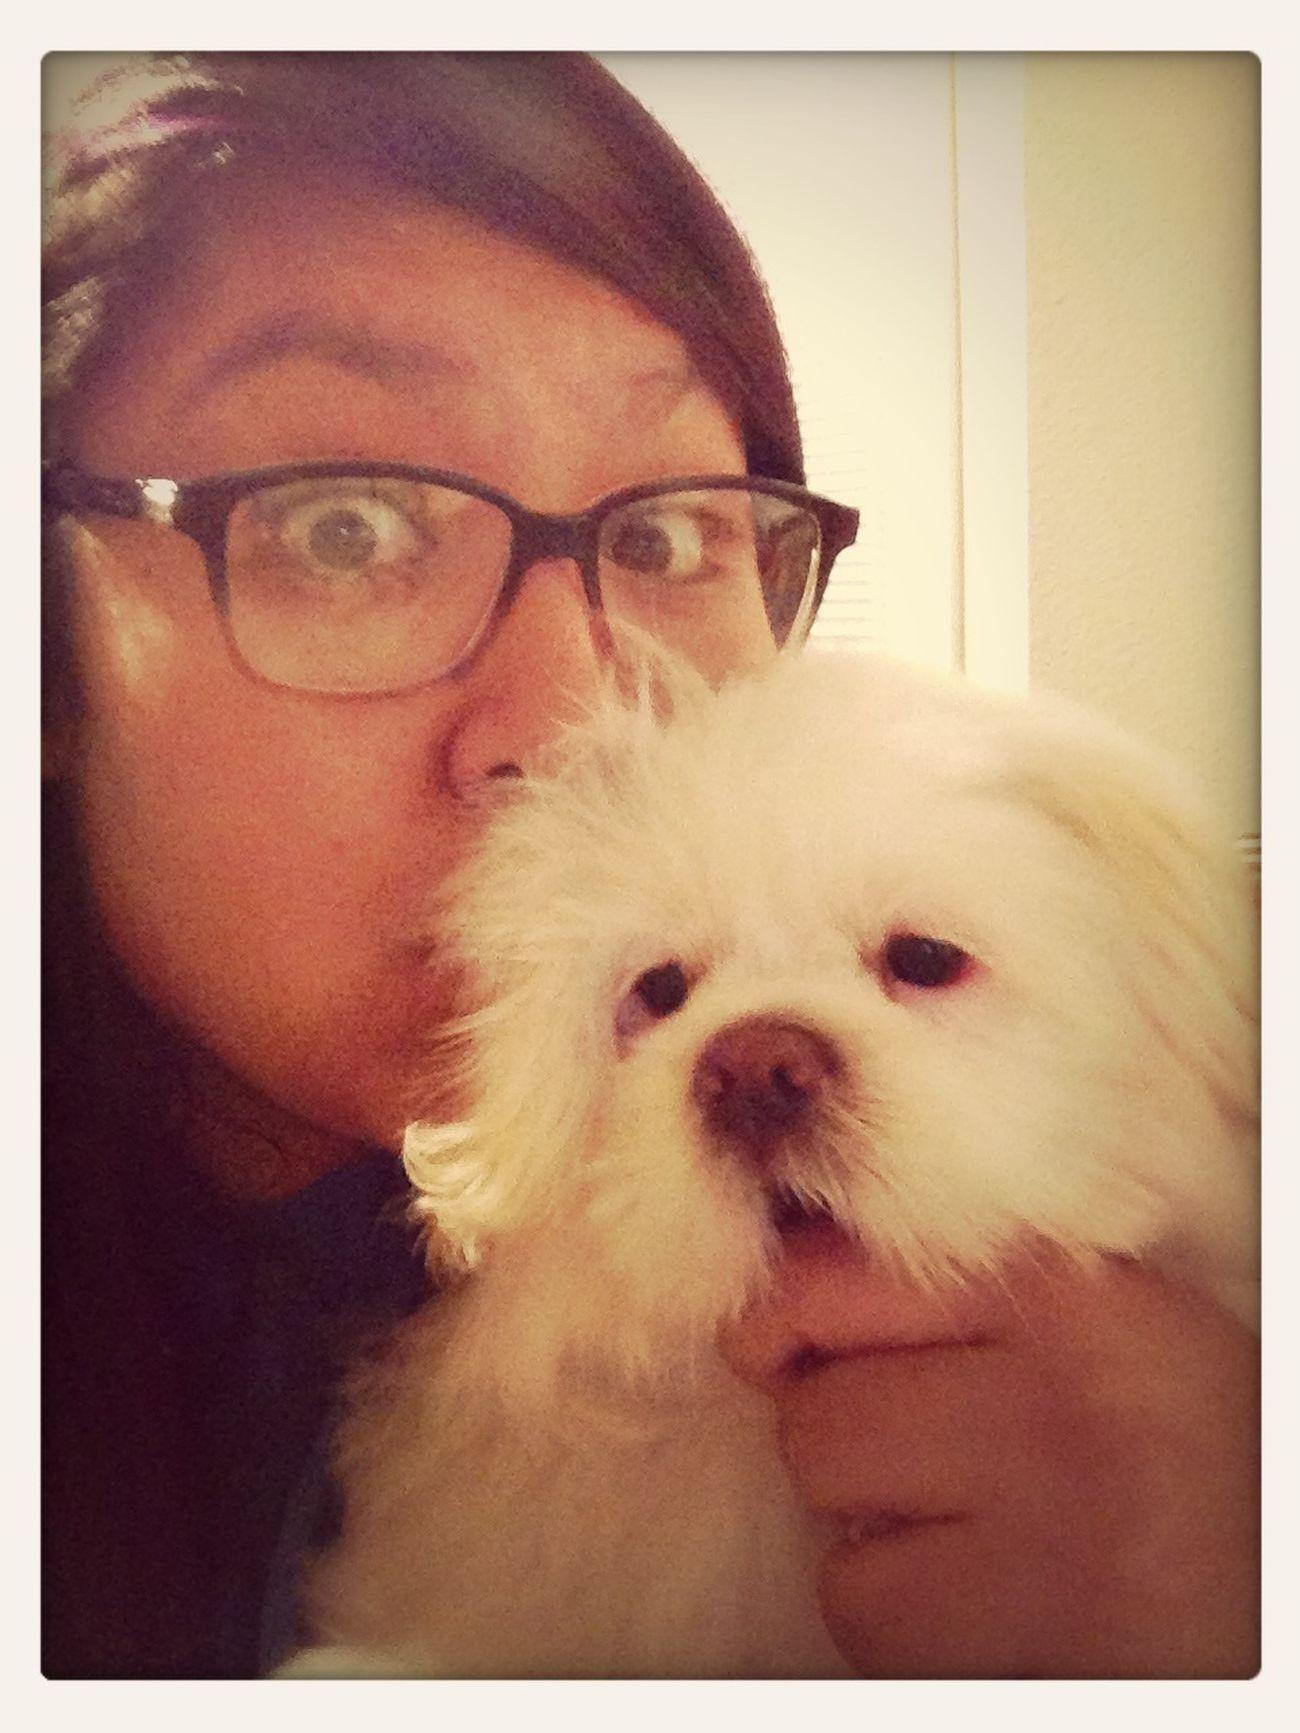 Hugitooo & I